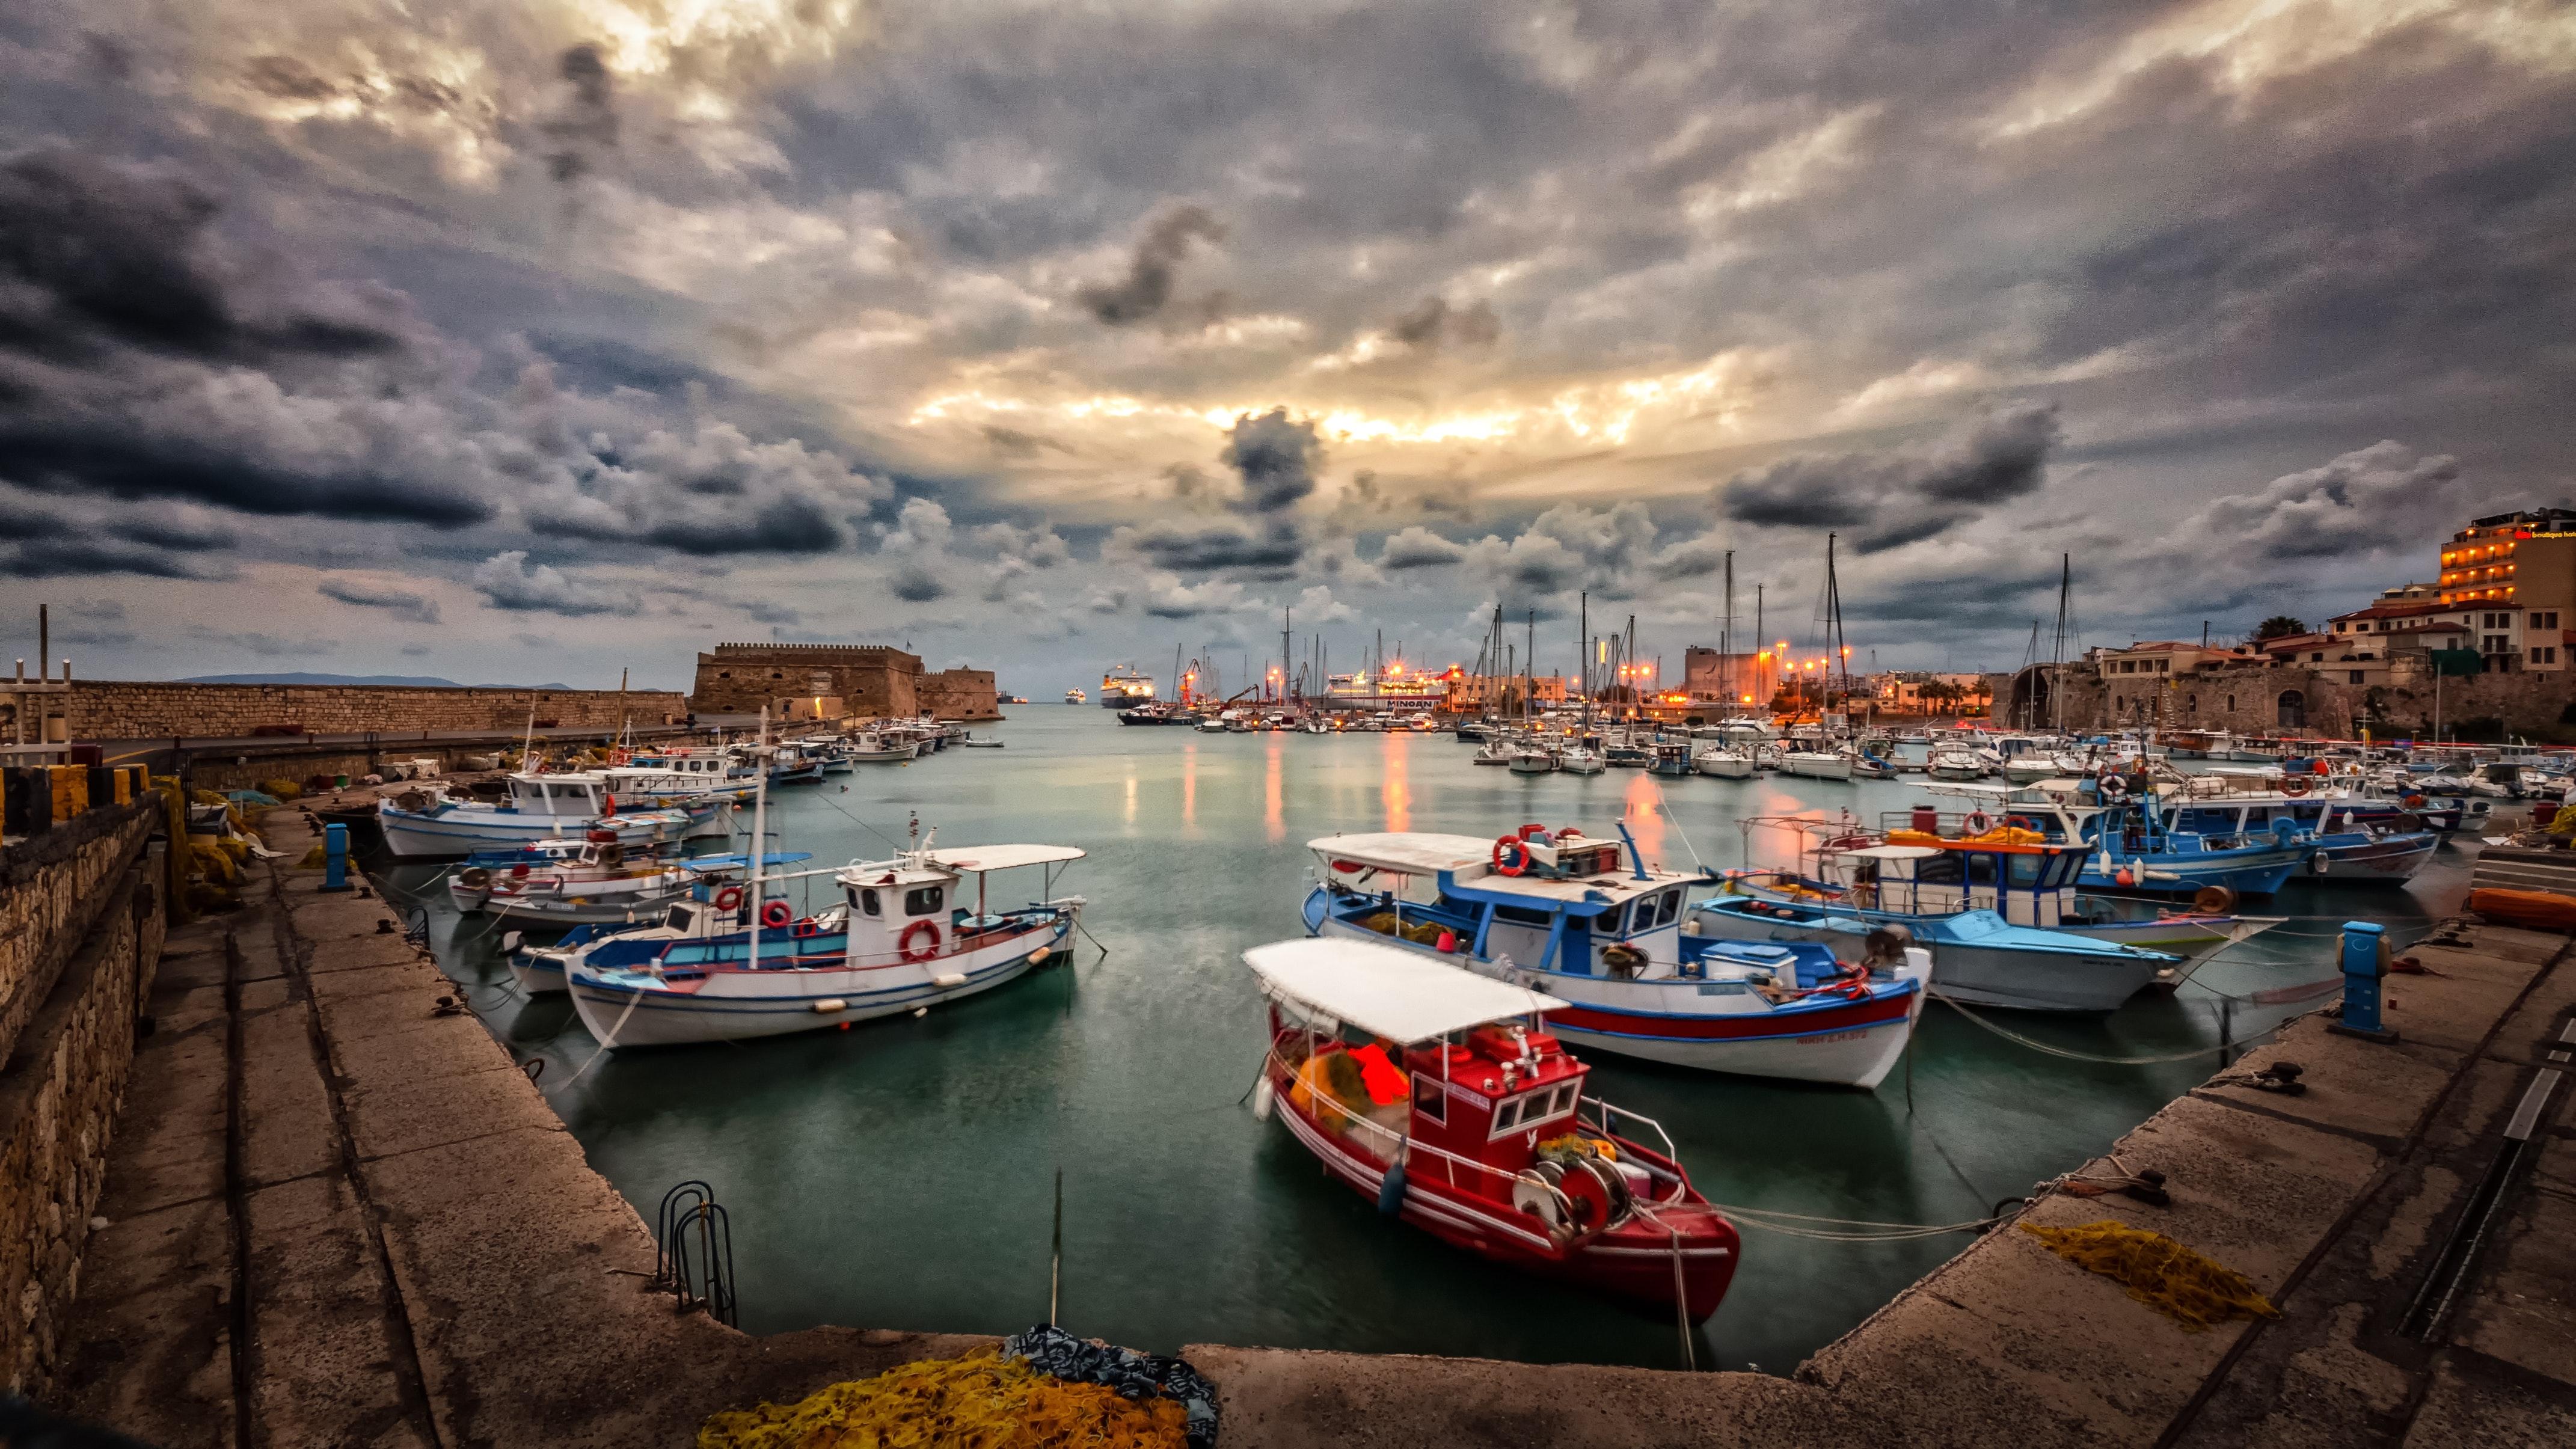 Assorted fishing boats photo